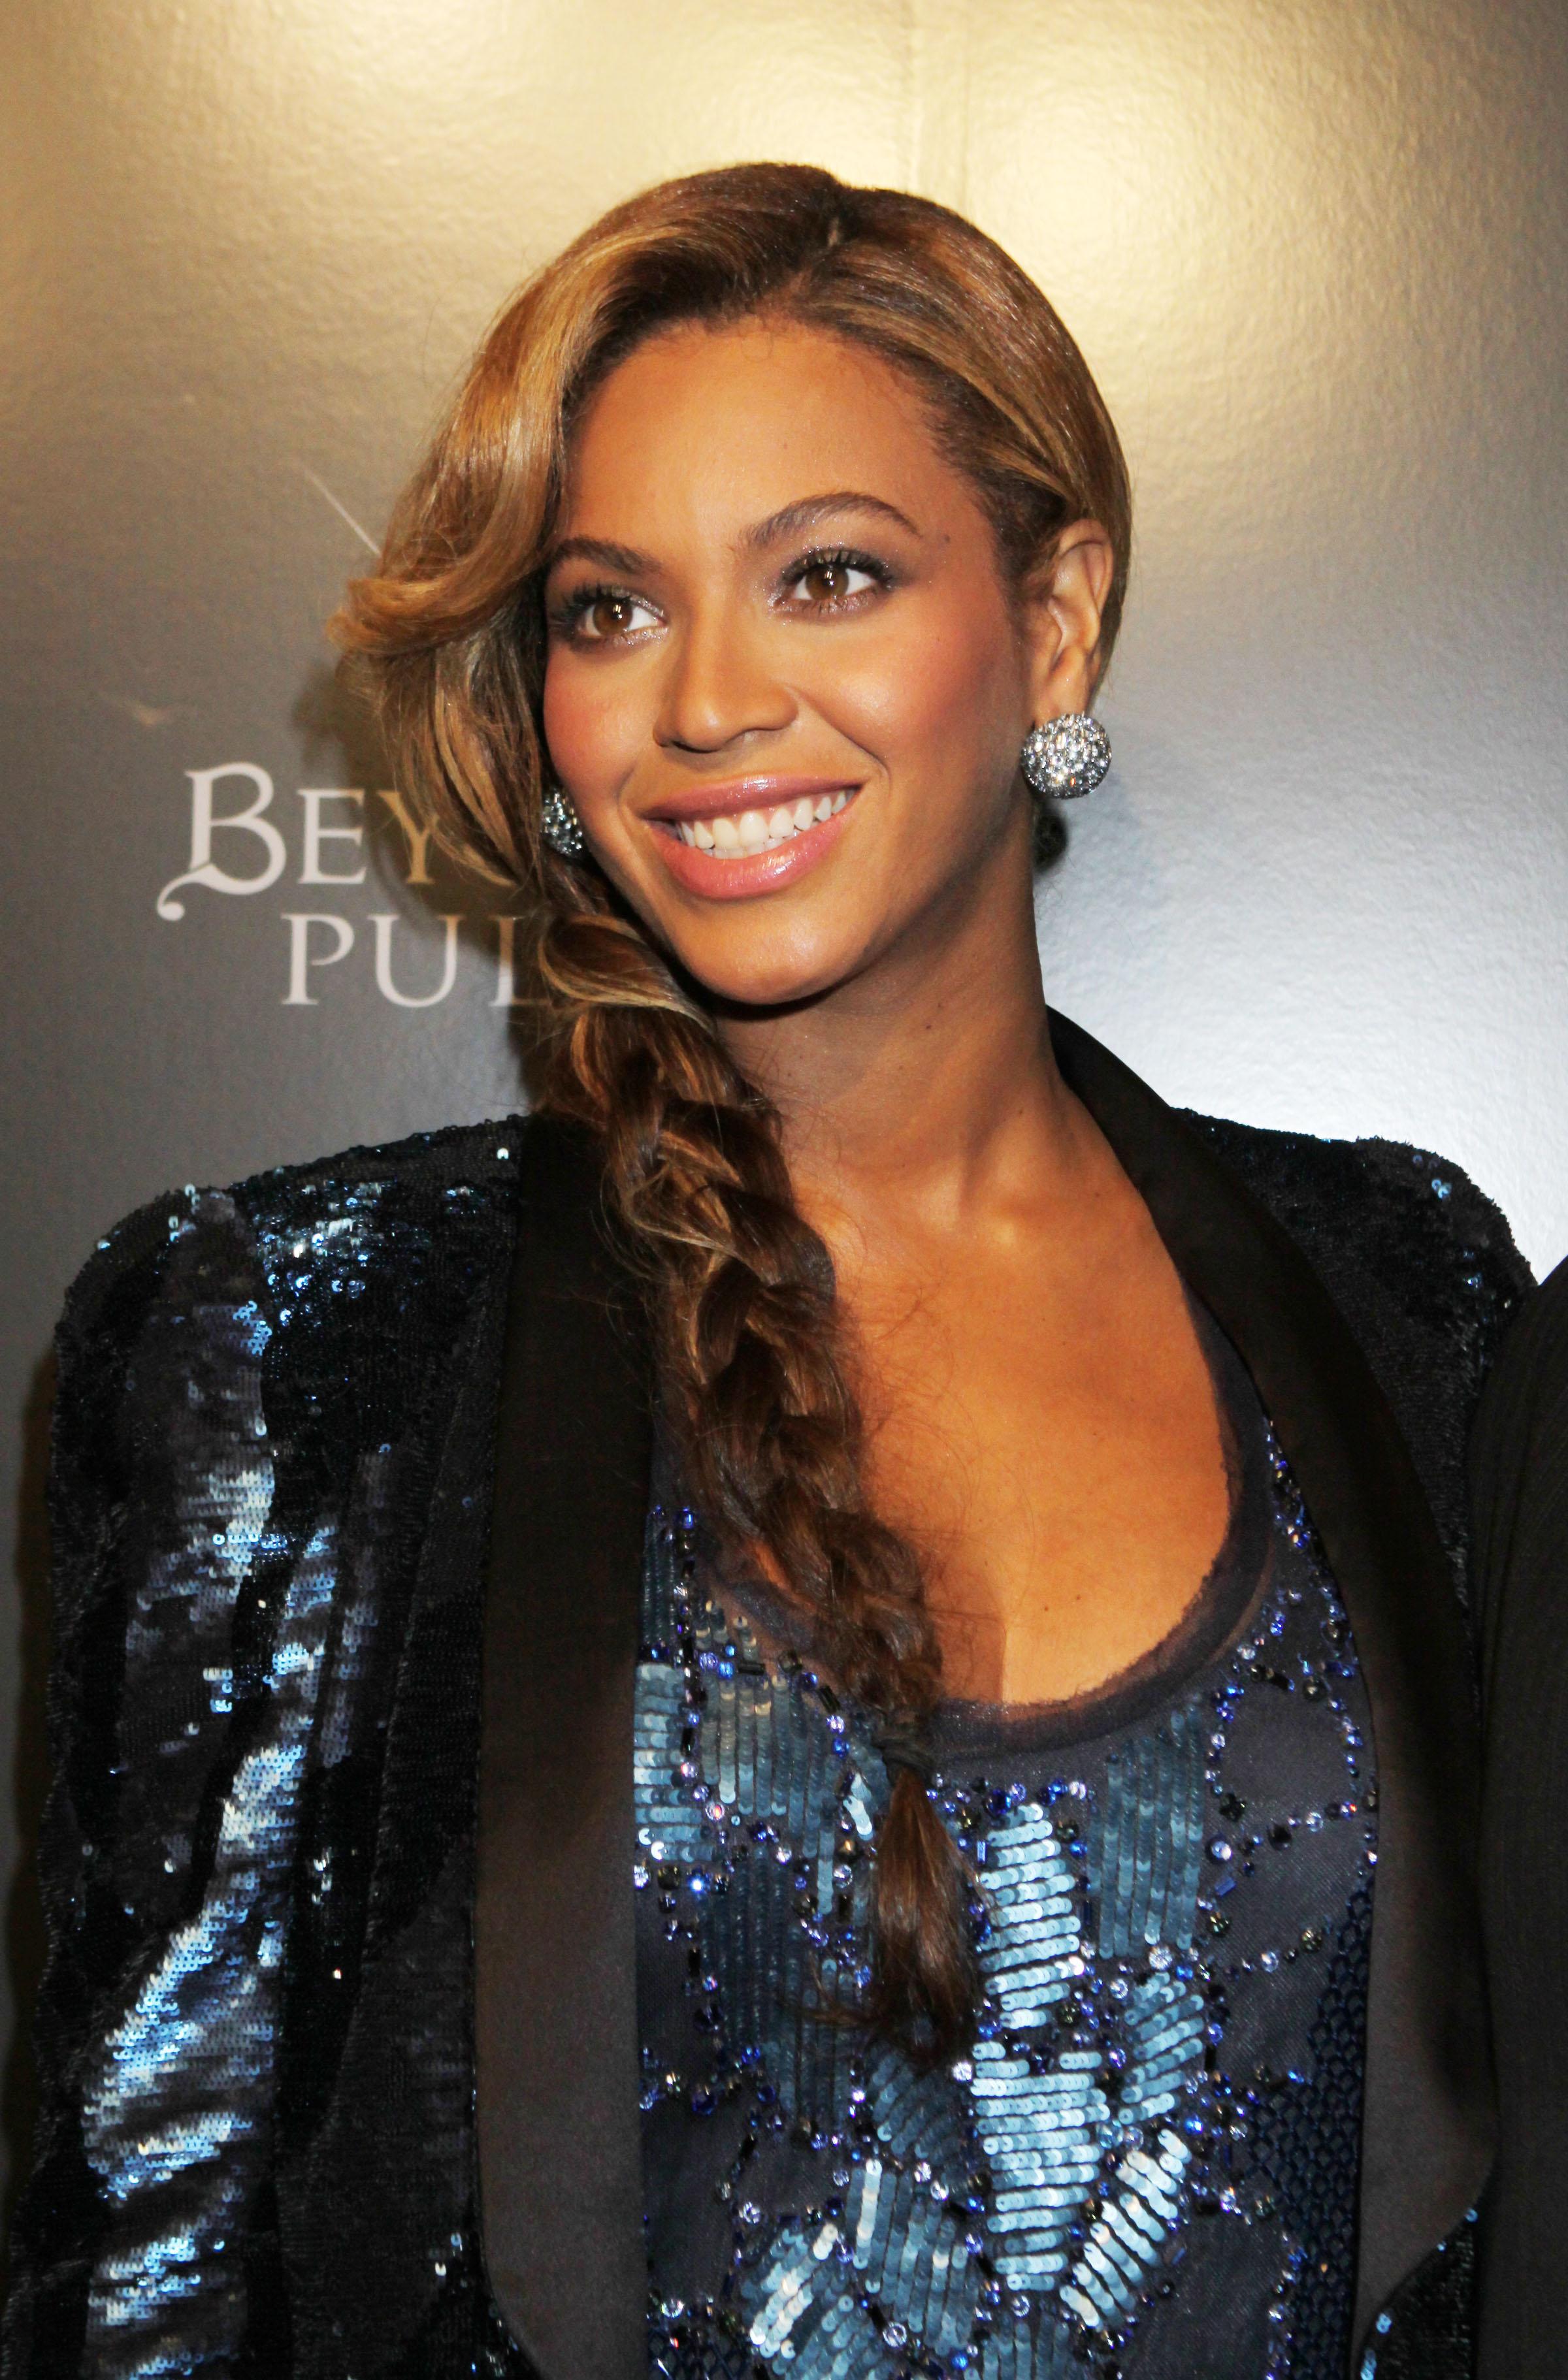 FP 7916530 Beyonce Pulse NYC 05 24